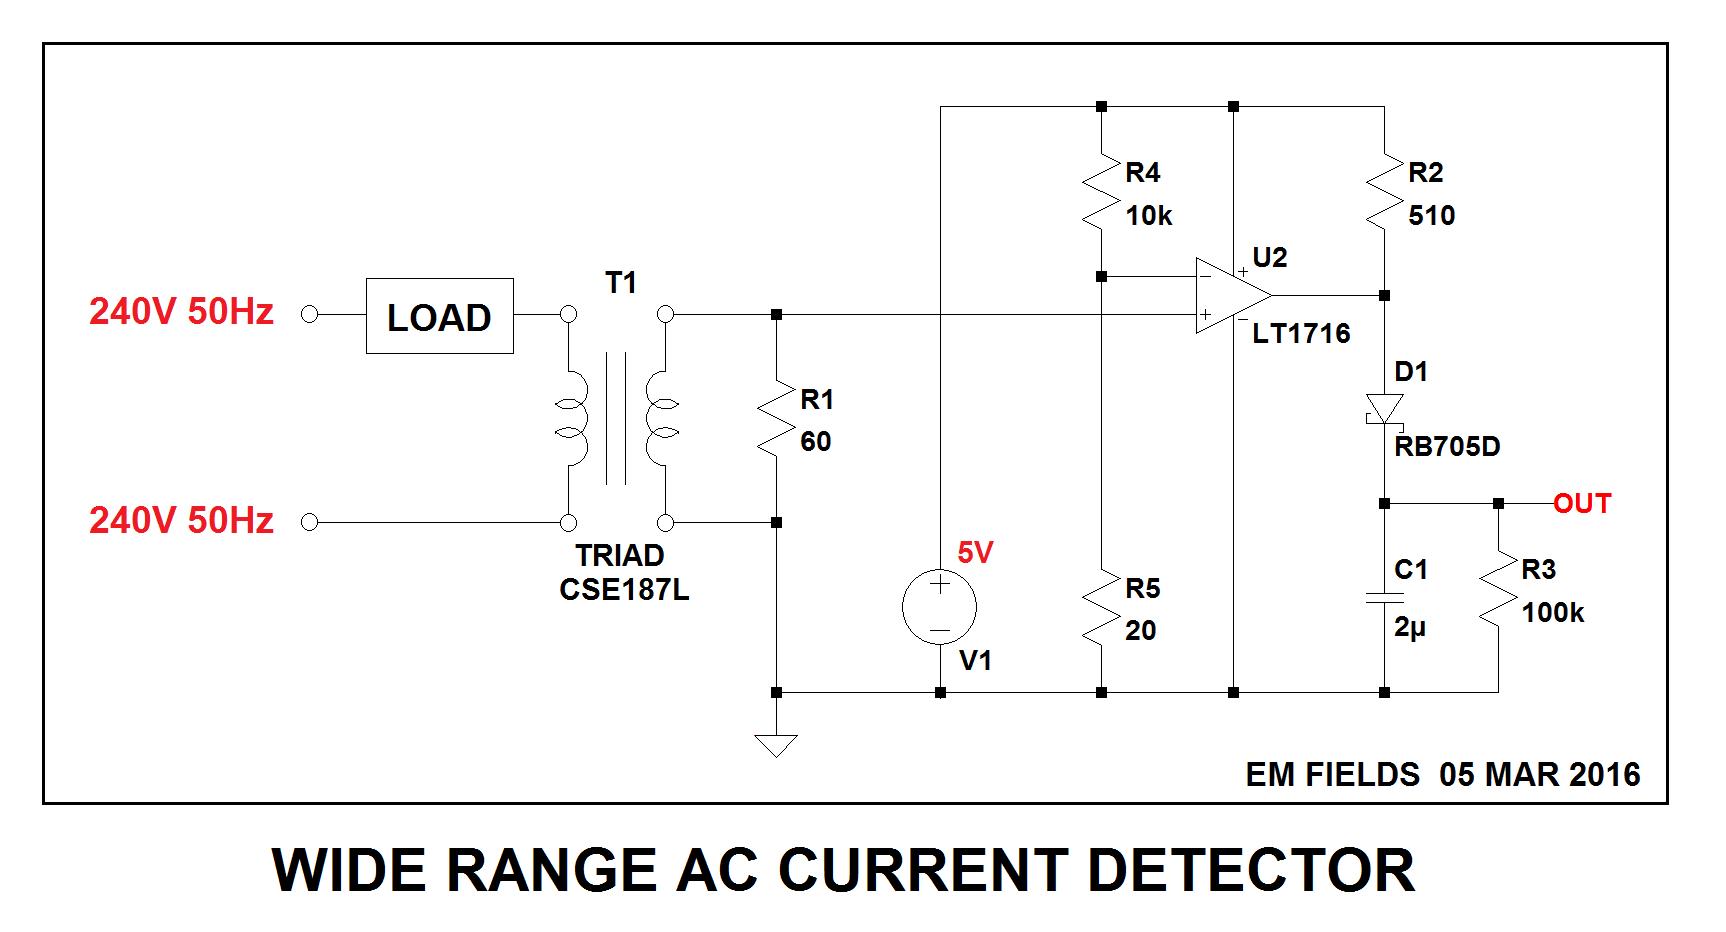 zenith motion sensor wiring diagram nissan fuse box line voltage occupancy lighting ~ elsalvadorla